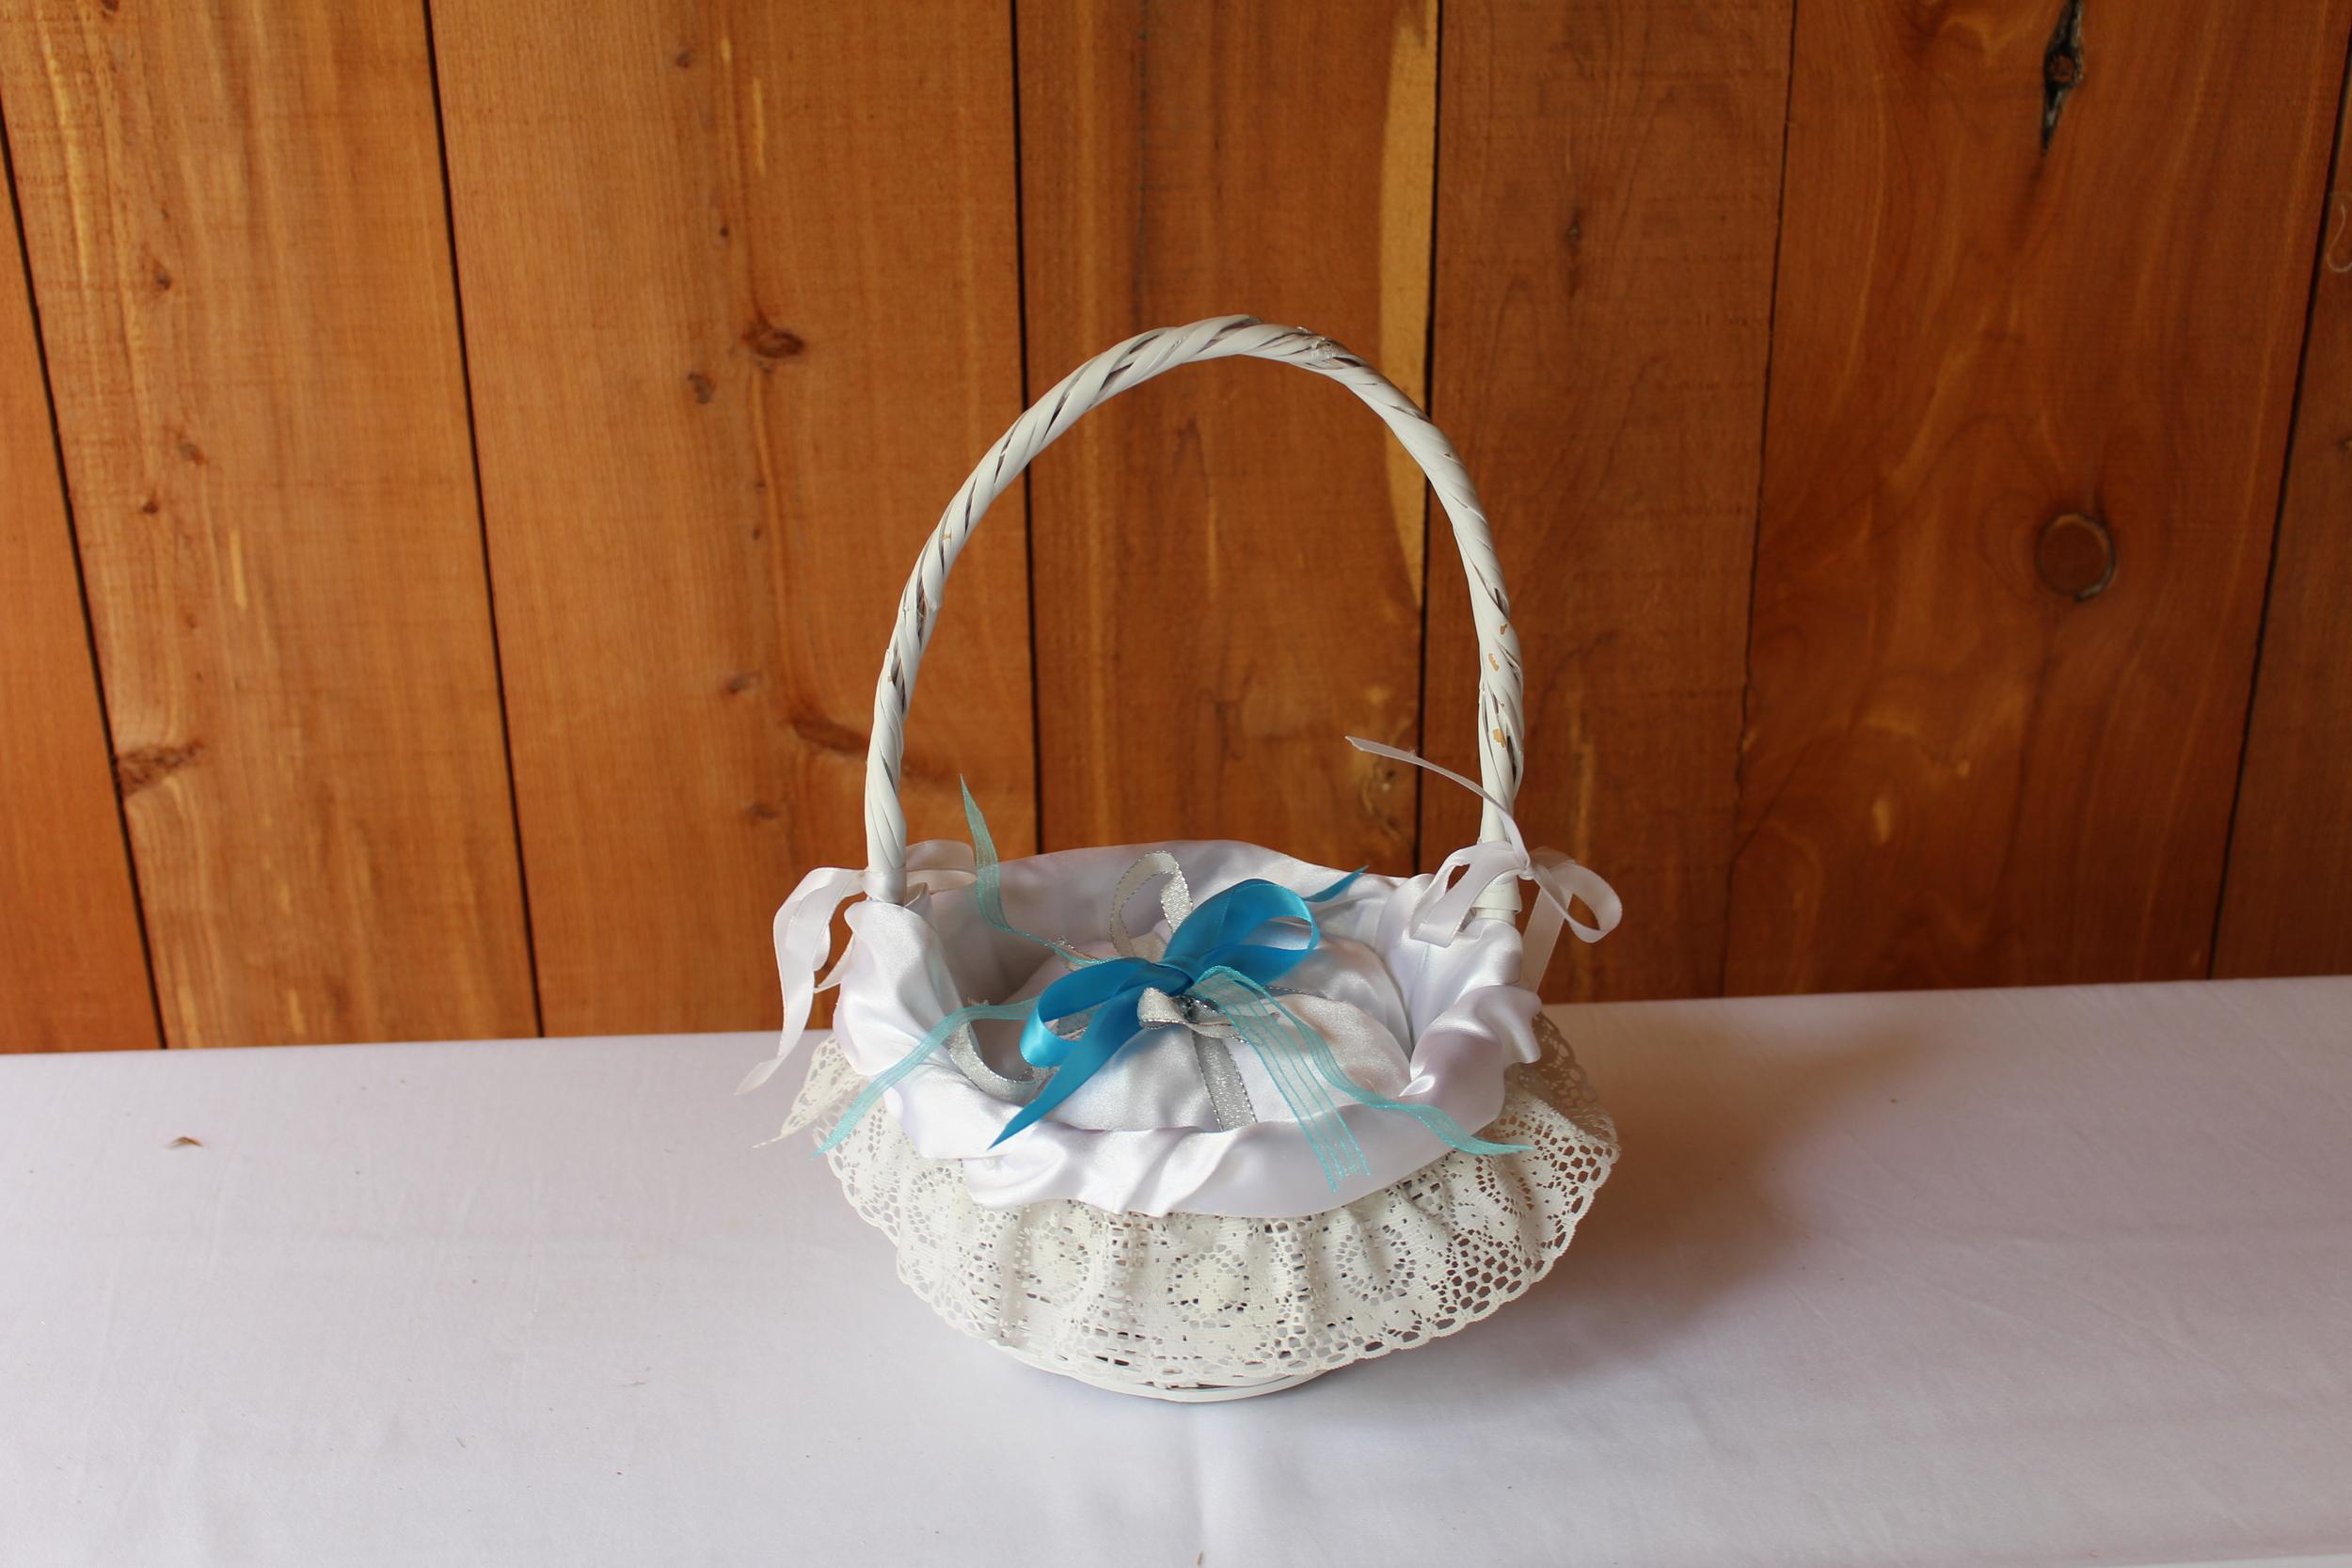 #81 - White Ruffle Basket